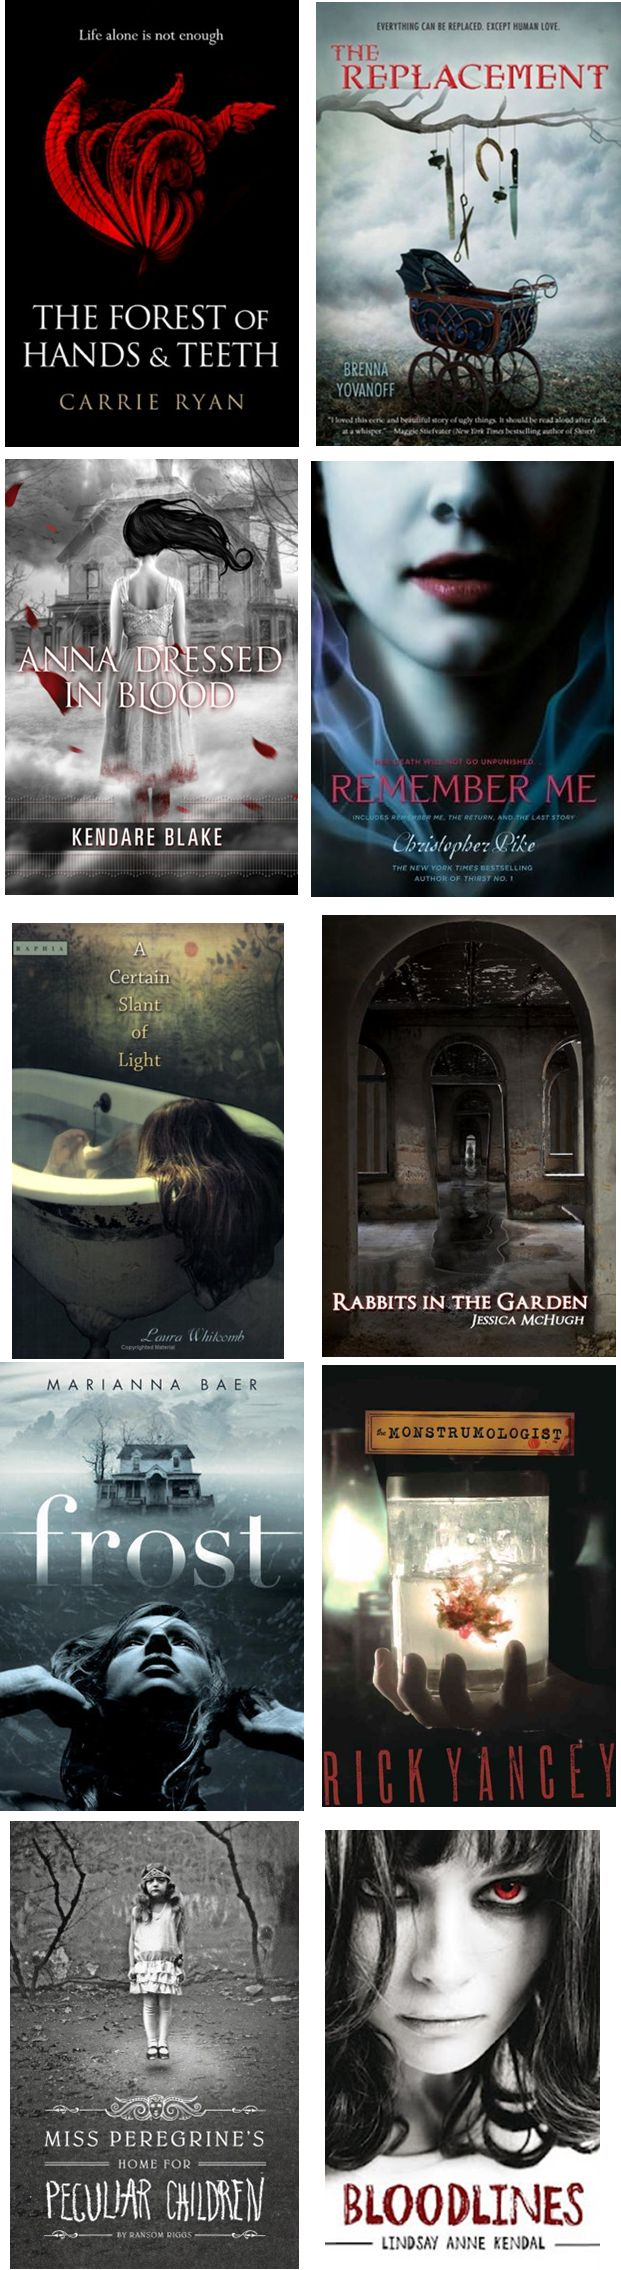 Good scary/creepy books